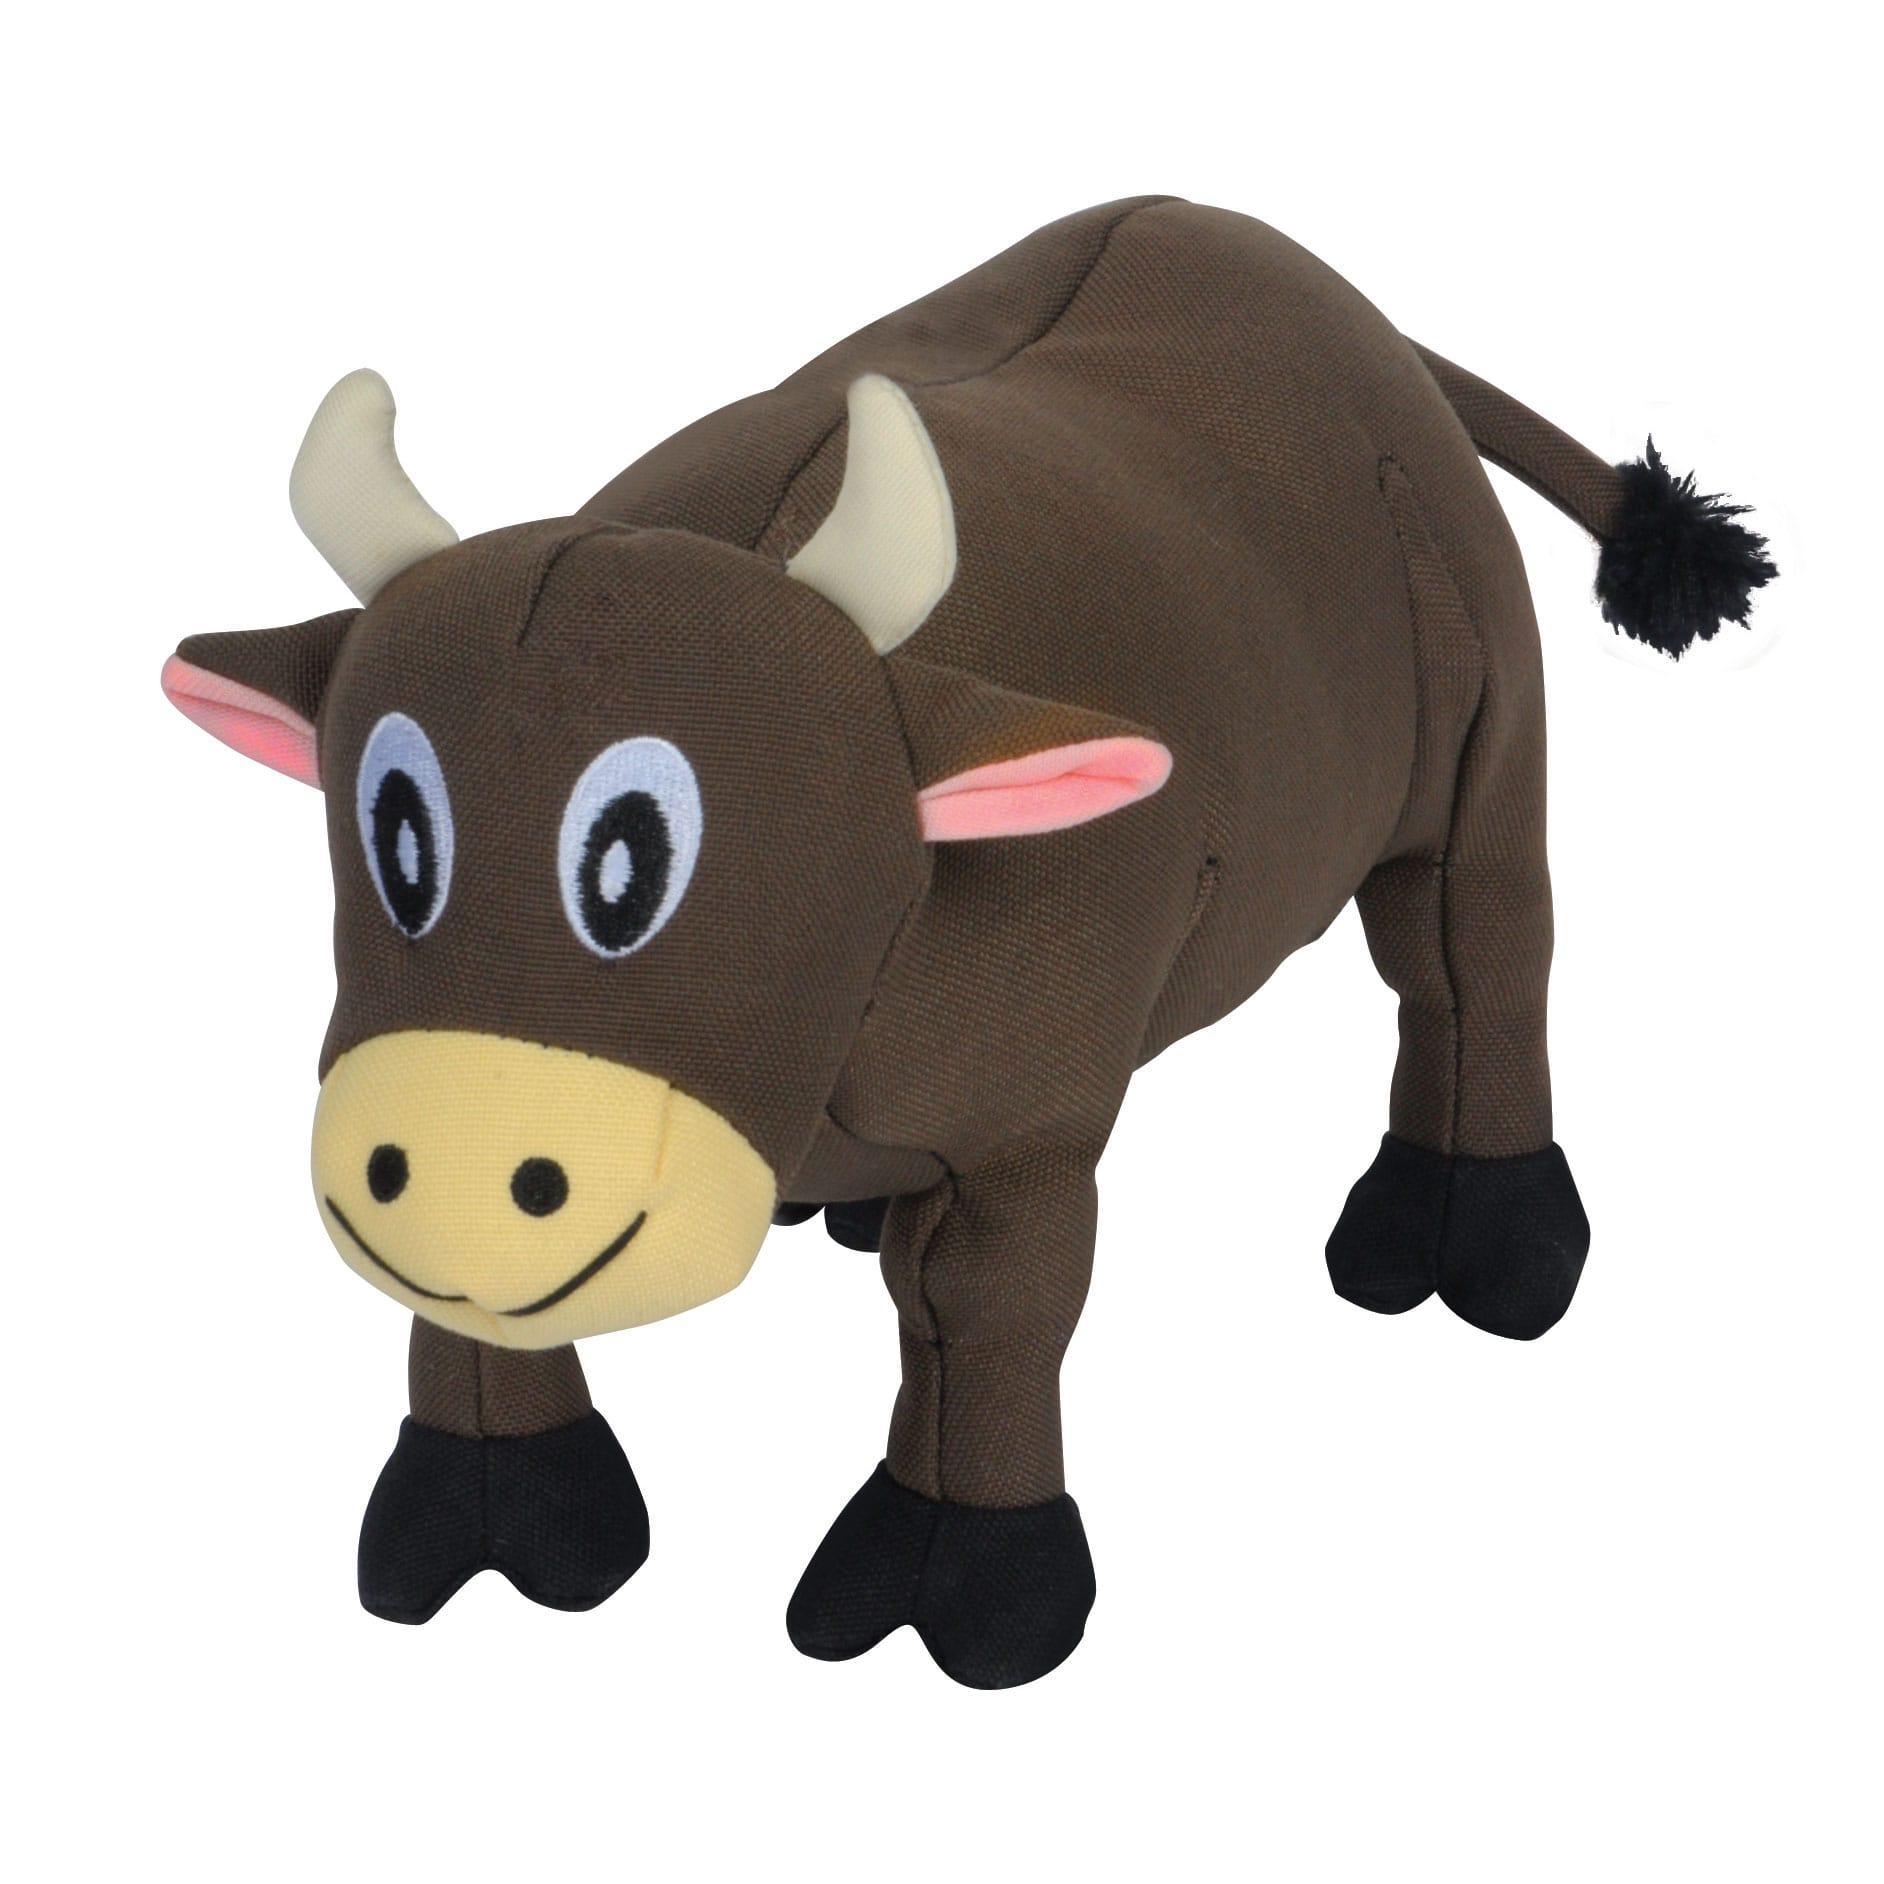 Smart Pet Love Tender-Tuffs Plump Cow Dog Toy, Brown